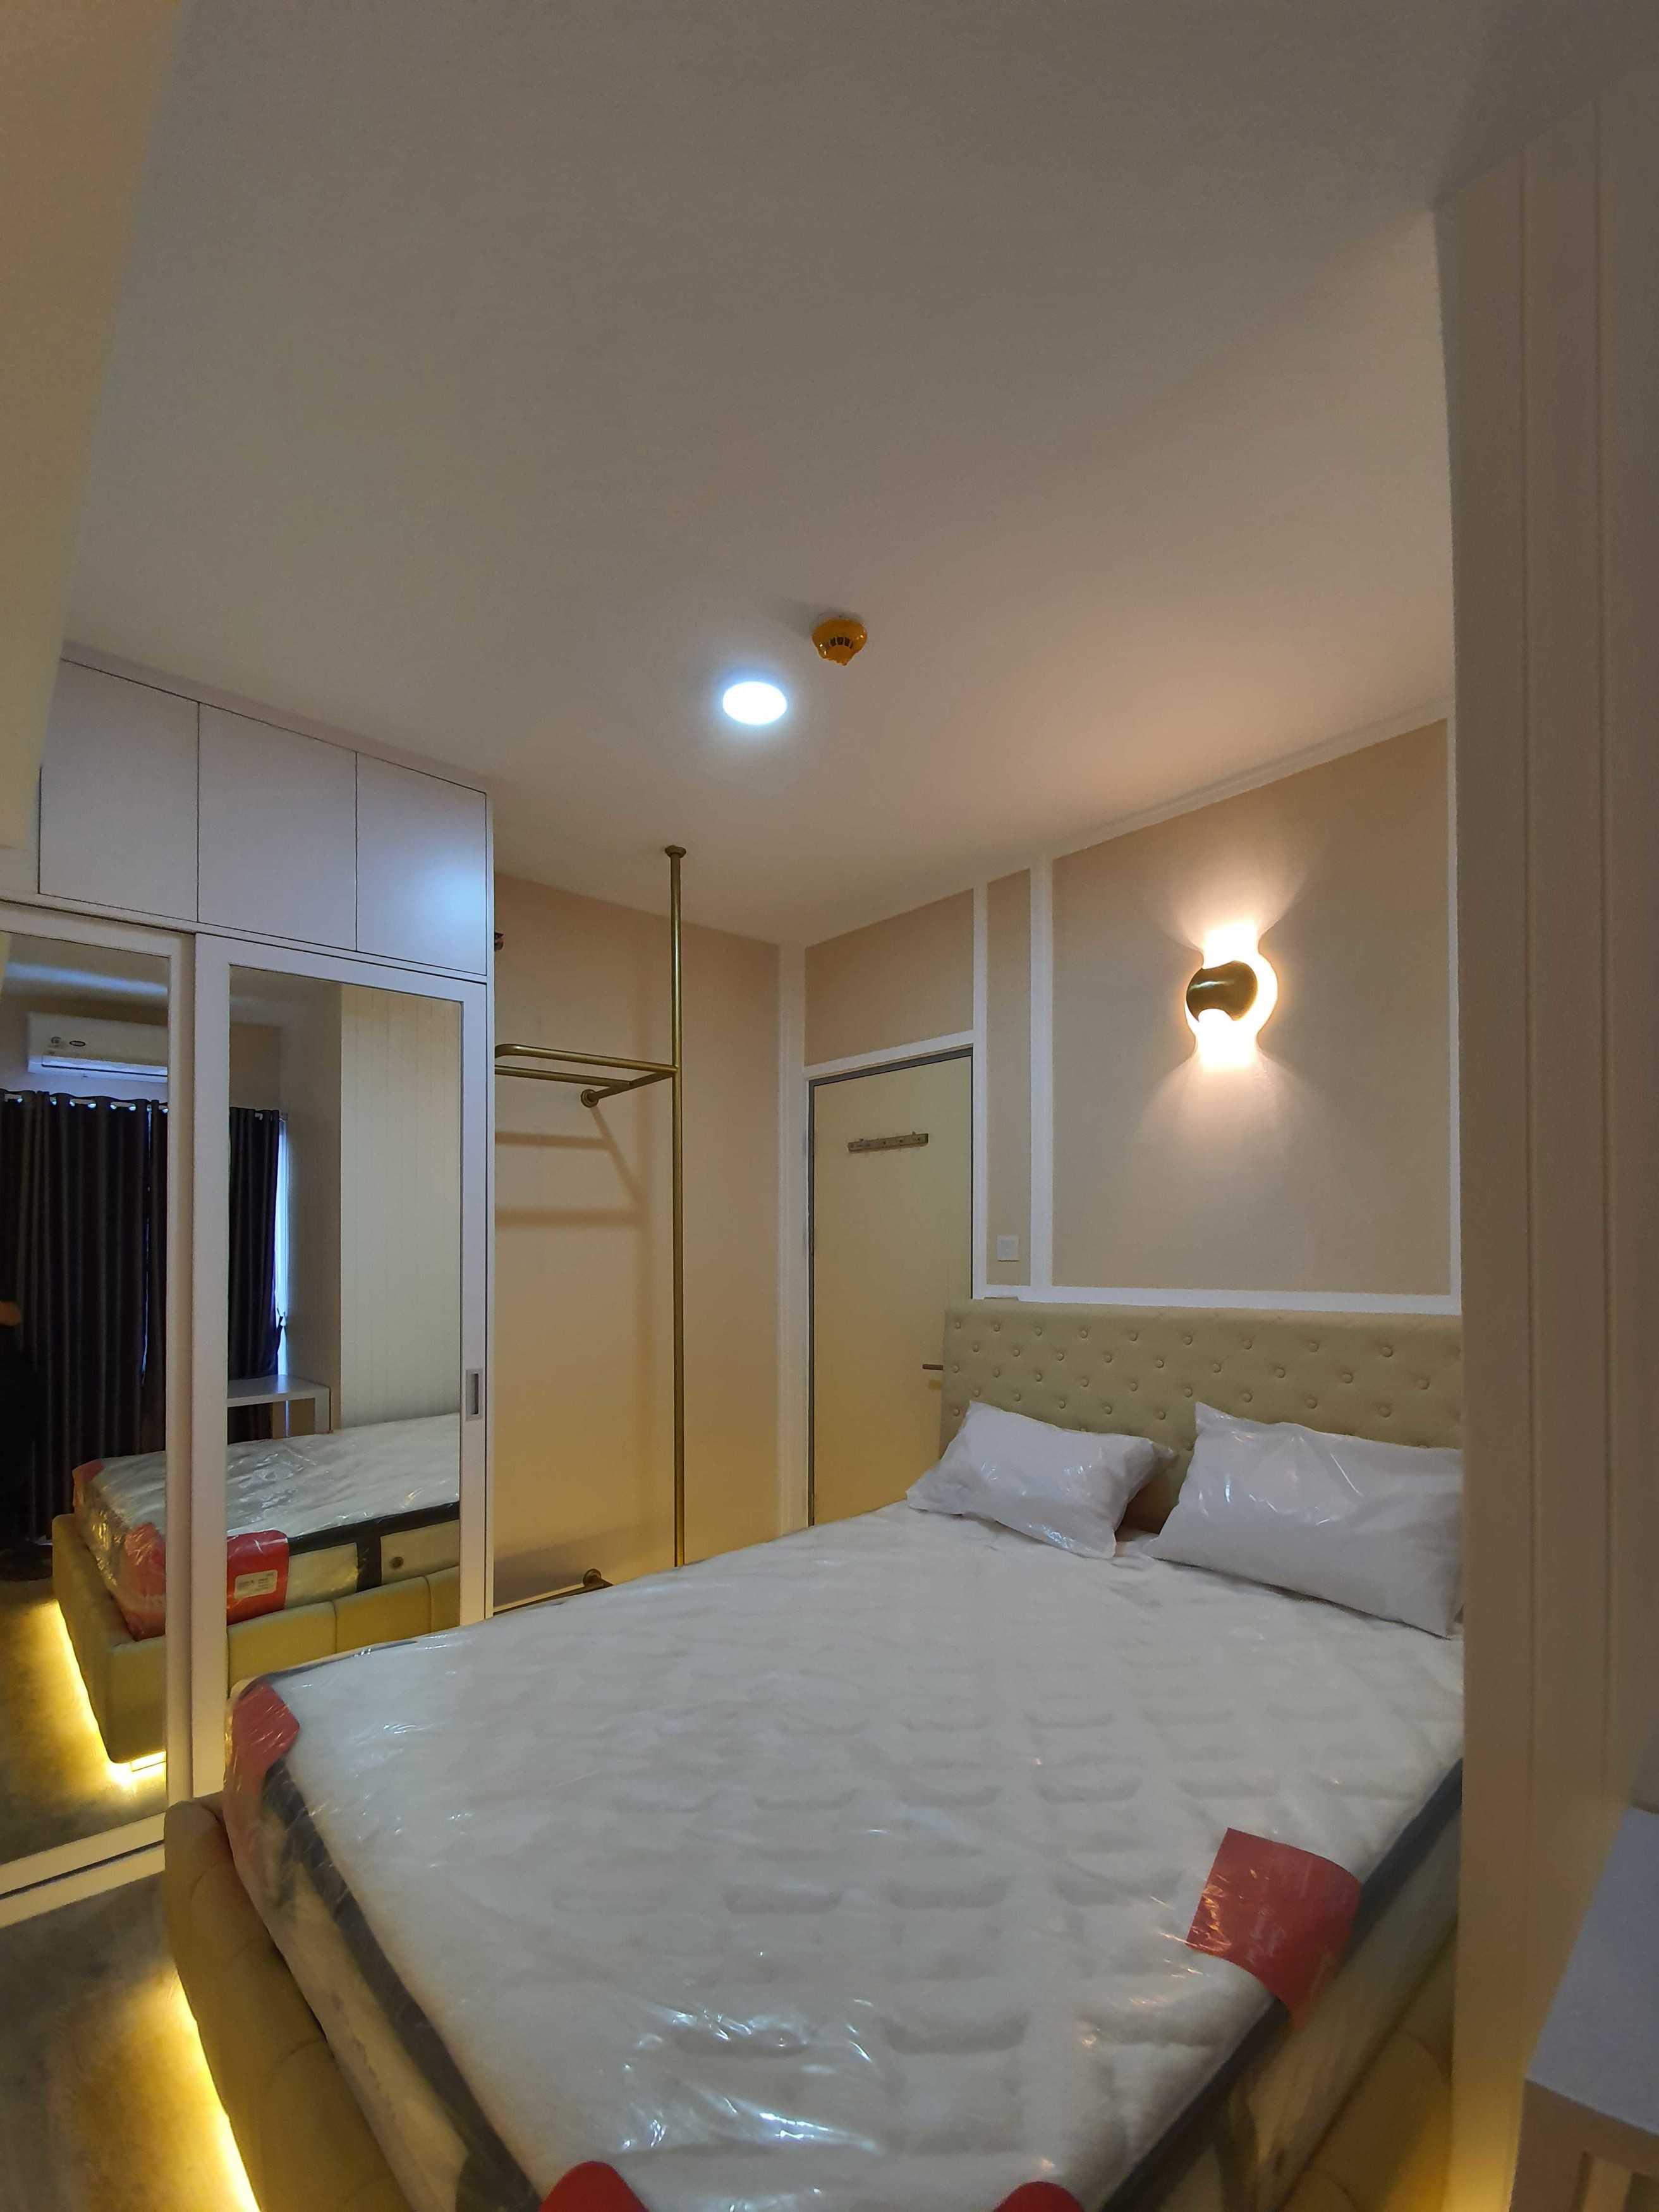 Wai Architect (Pt. Cipta Karya Seni) D+M Apartment Unit Jl. Gading Serpong Boulevard, Pakulonan Bar., Kec. Klp. Dua, Tangerang, Banten 15810, Indonesia Jl. Gading Serpong Boulevard, Pakulonan Bar., Kec. Klp. Dua, Tangerang, Banten 15810, Indonesia Wai-Architect-Pt-Cipta-Karya-Seni-Dm-Apartment-Unit   115123